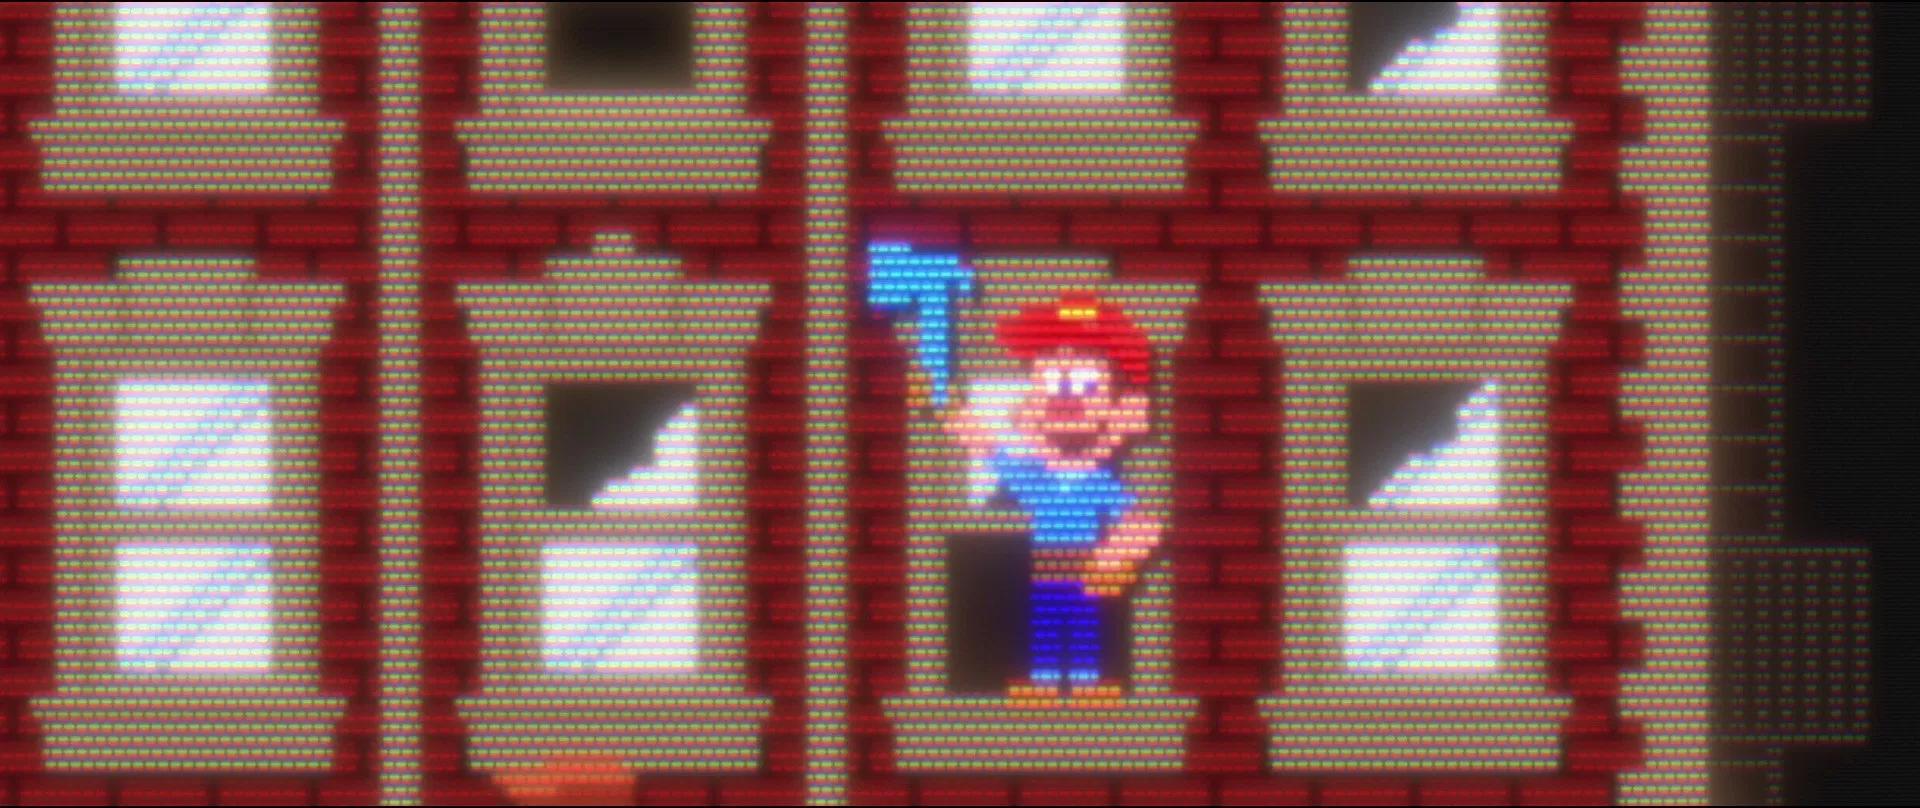 File:Wreck-it-ralph fix-it-felix arcade-ad.jpg